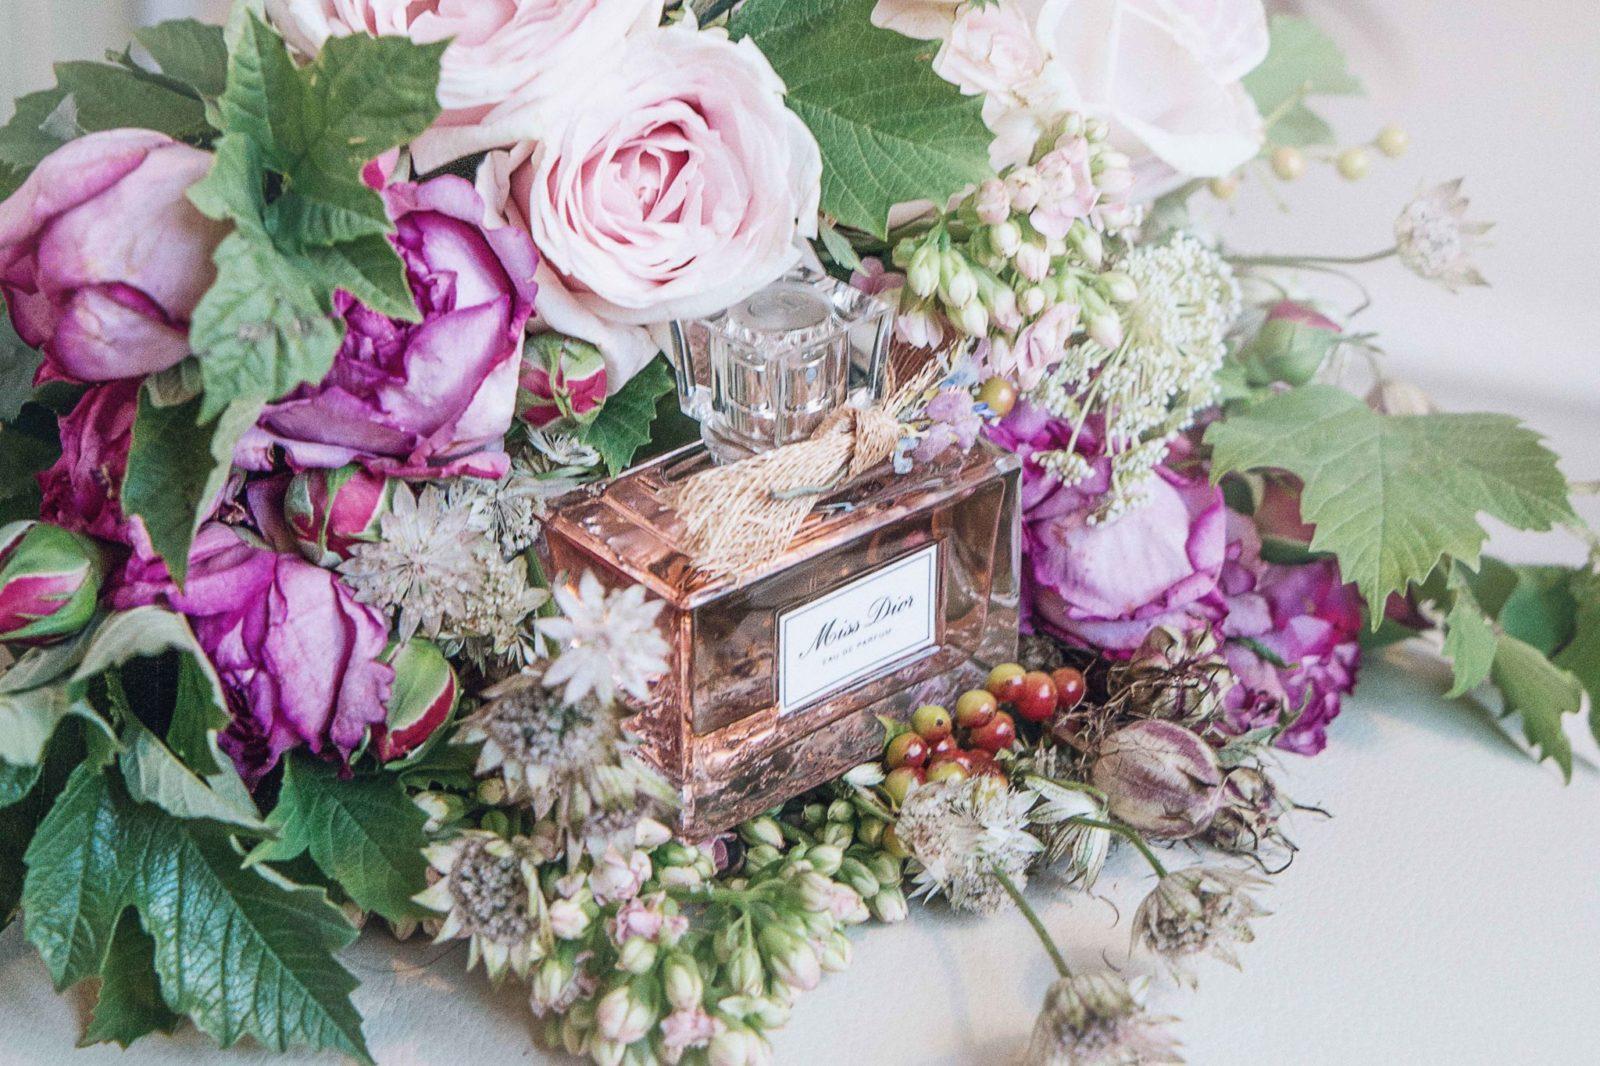 Miss dior fragrance that smells like love glam glitter femininity of a sensual floral izmirmasajfo